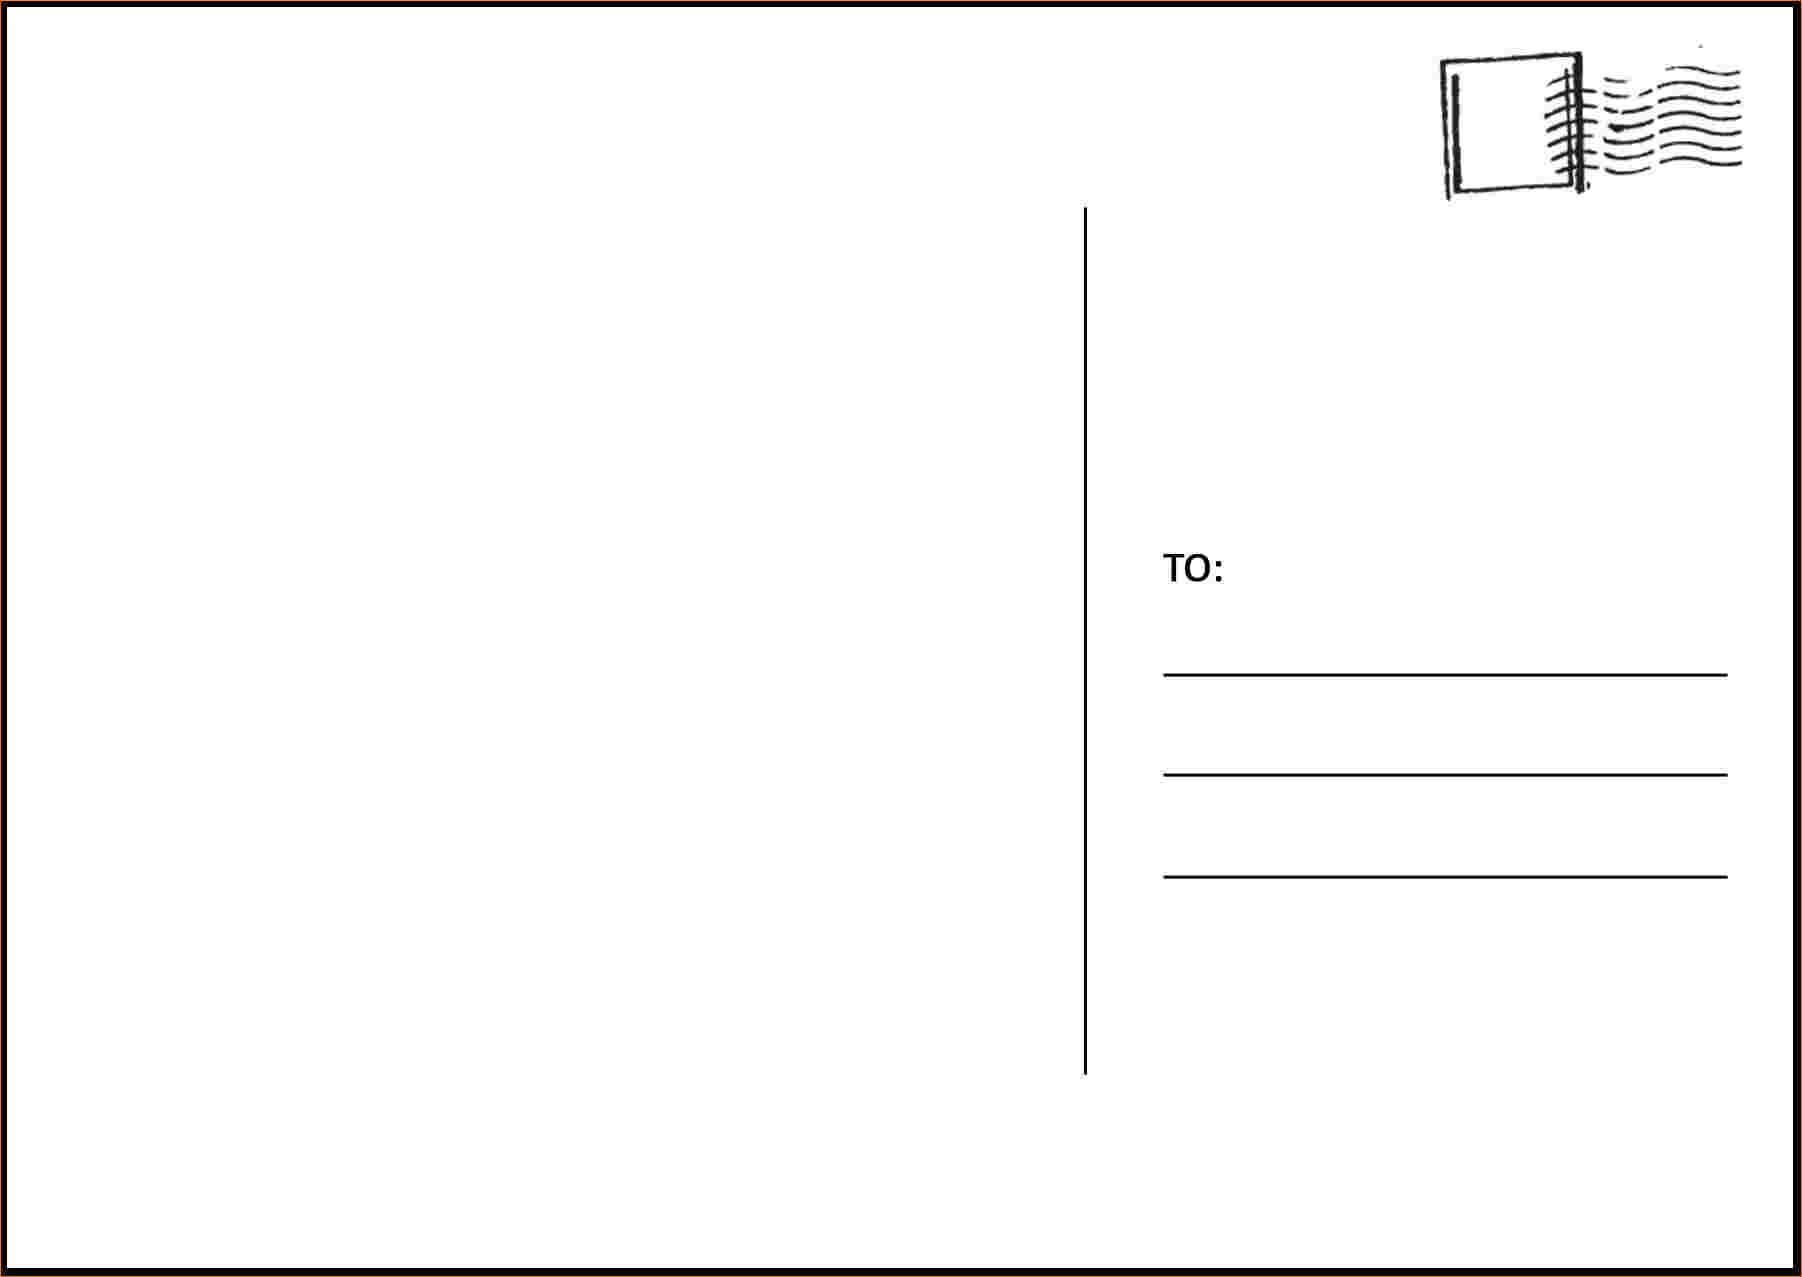 ms word postcard templates. Black Bedroom Furniture Sets. Home Design Ideas